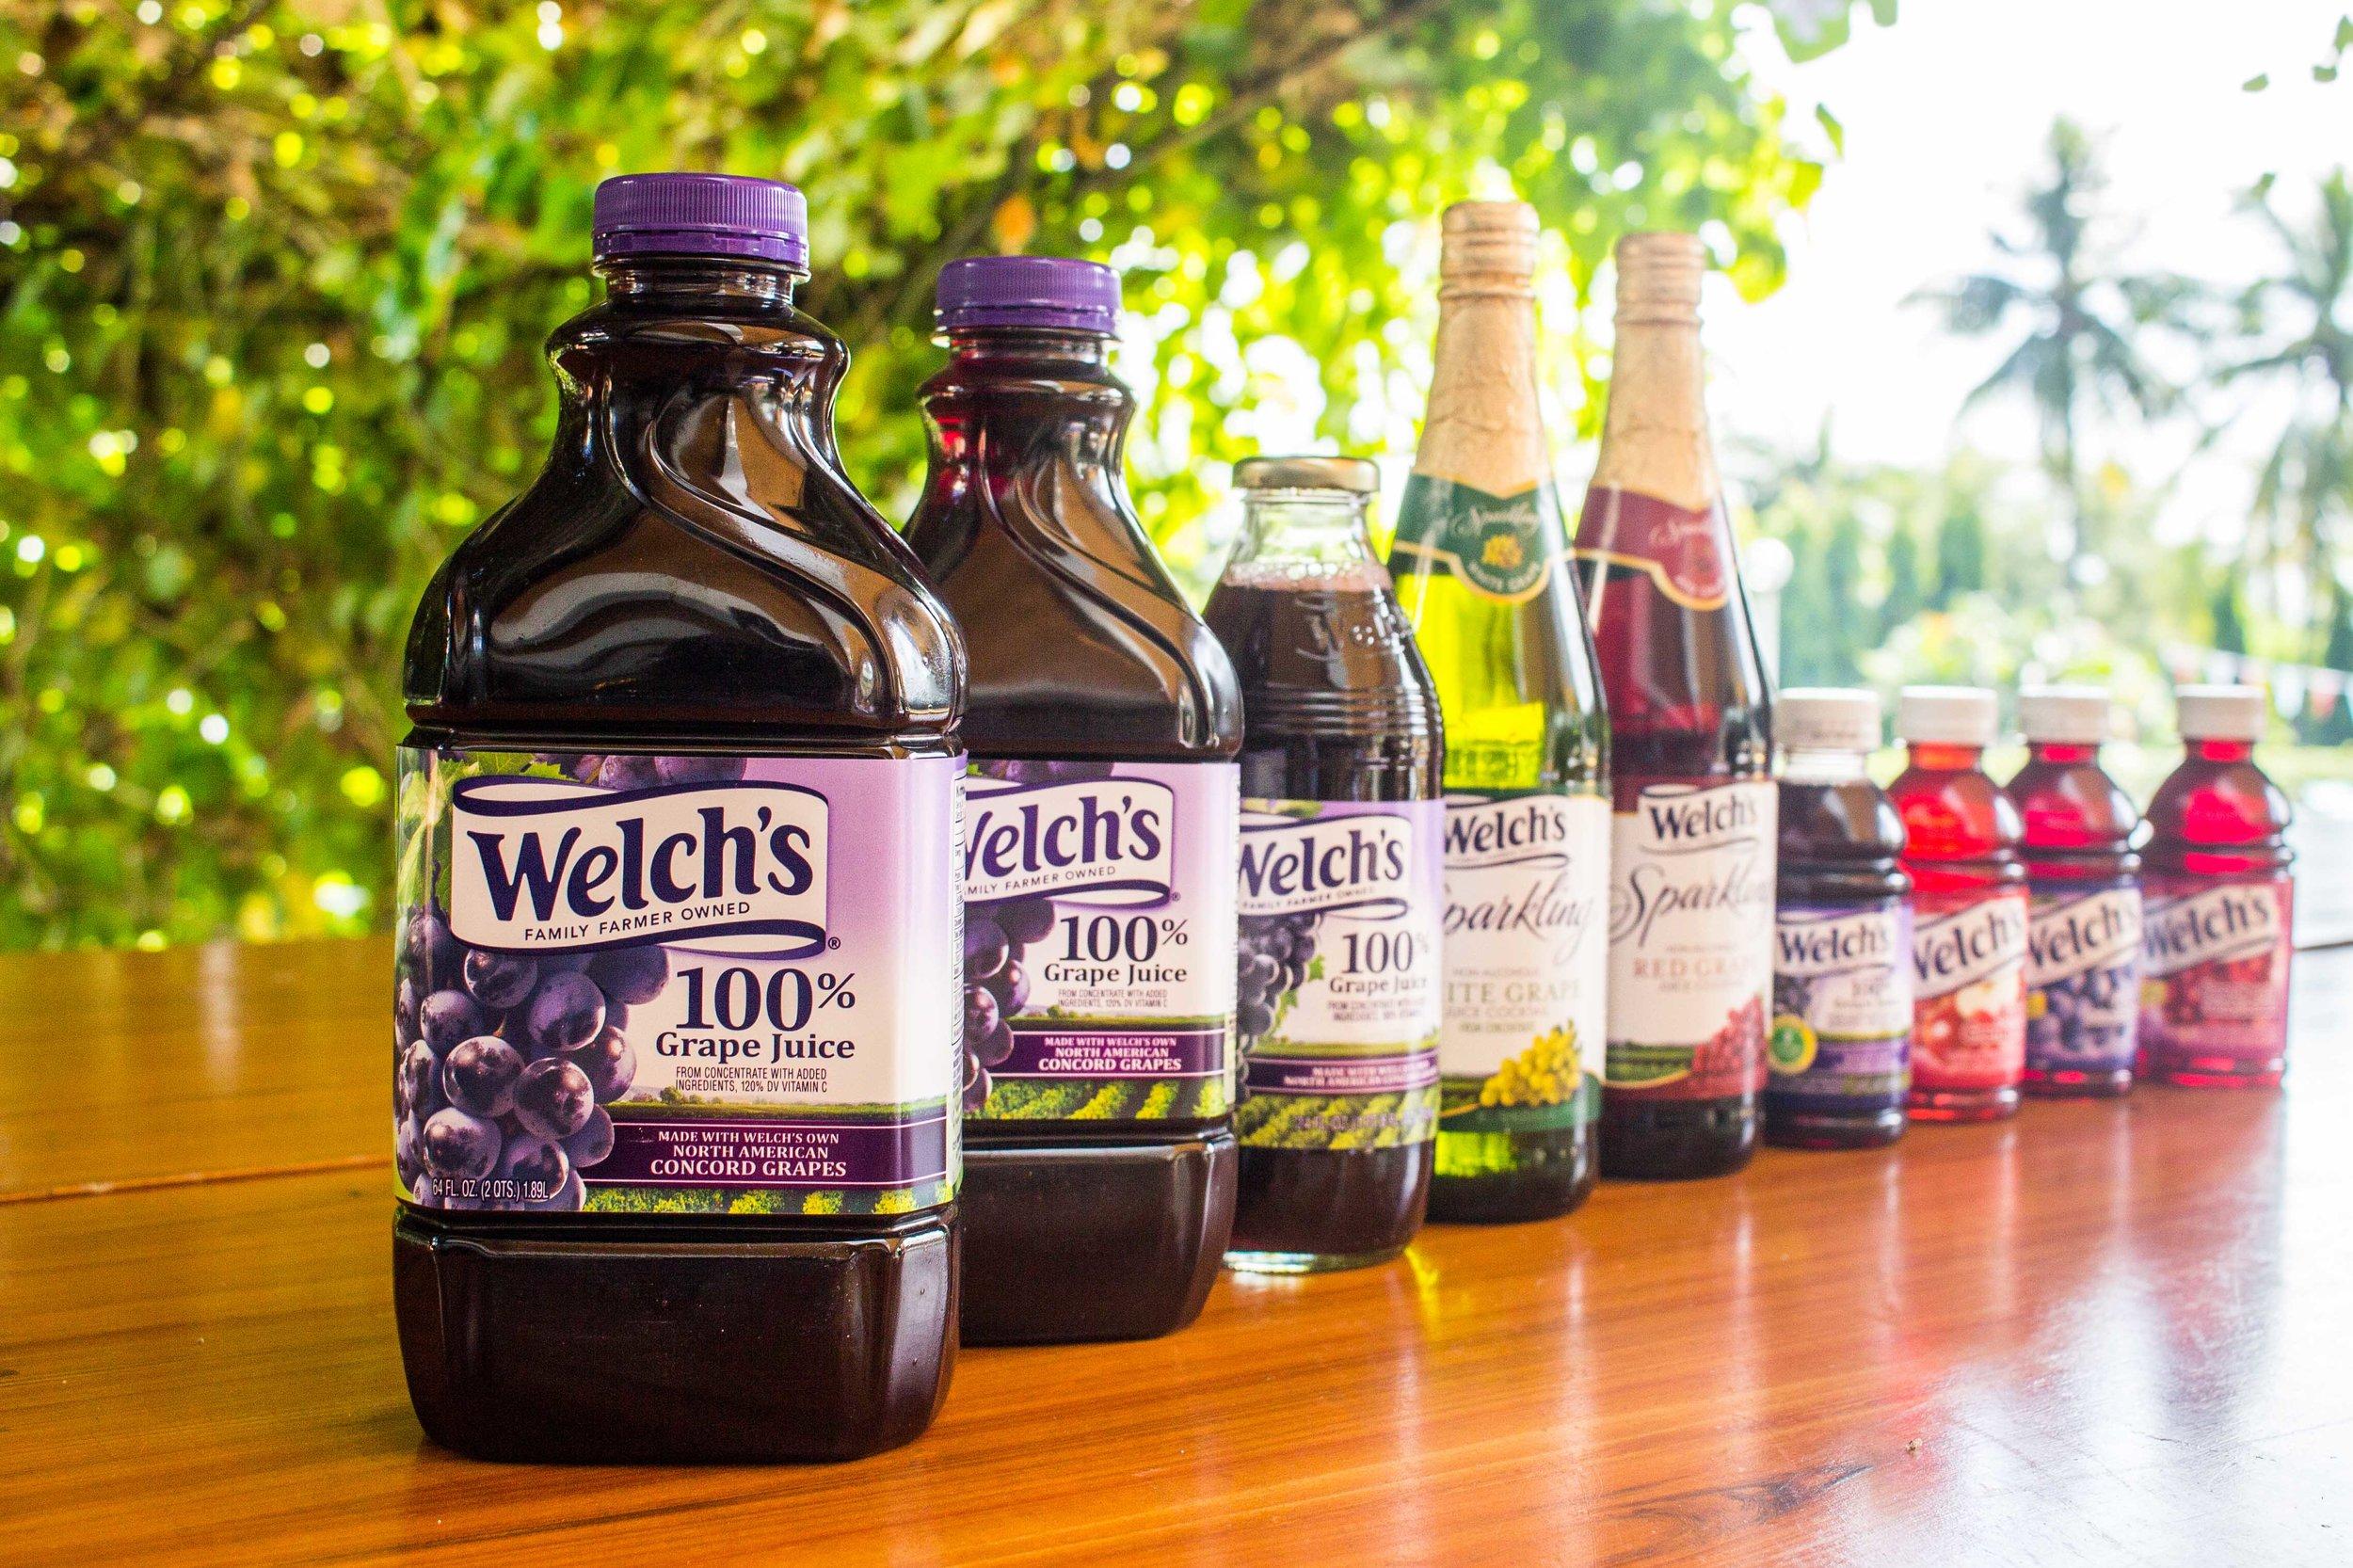 Welchs-variants-sold-in-the-PH.jpg